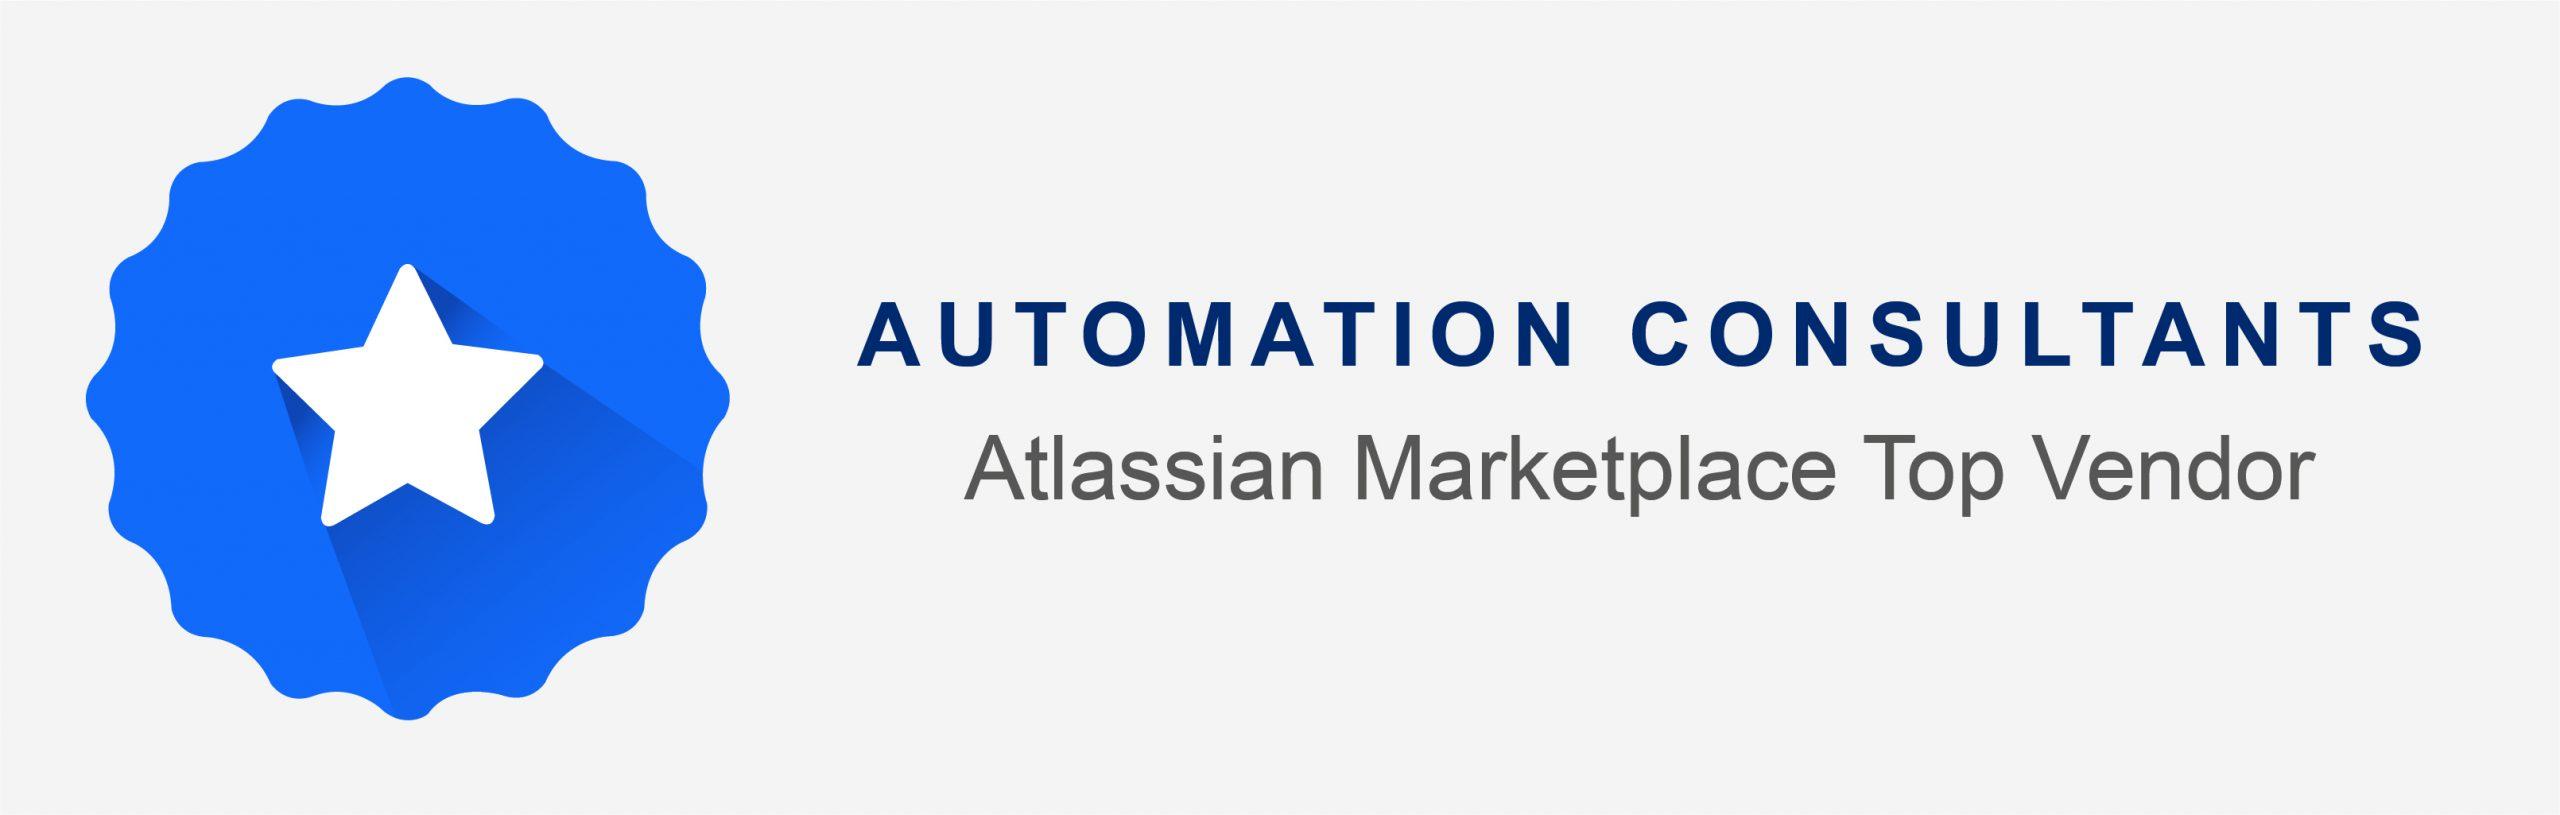 Top Vendor on the Atlassian Marketplace!